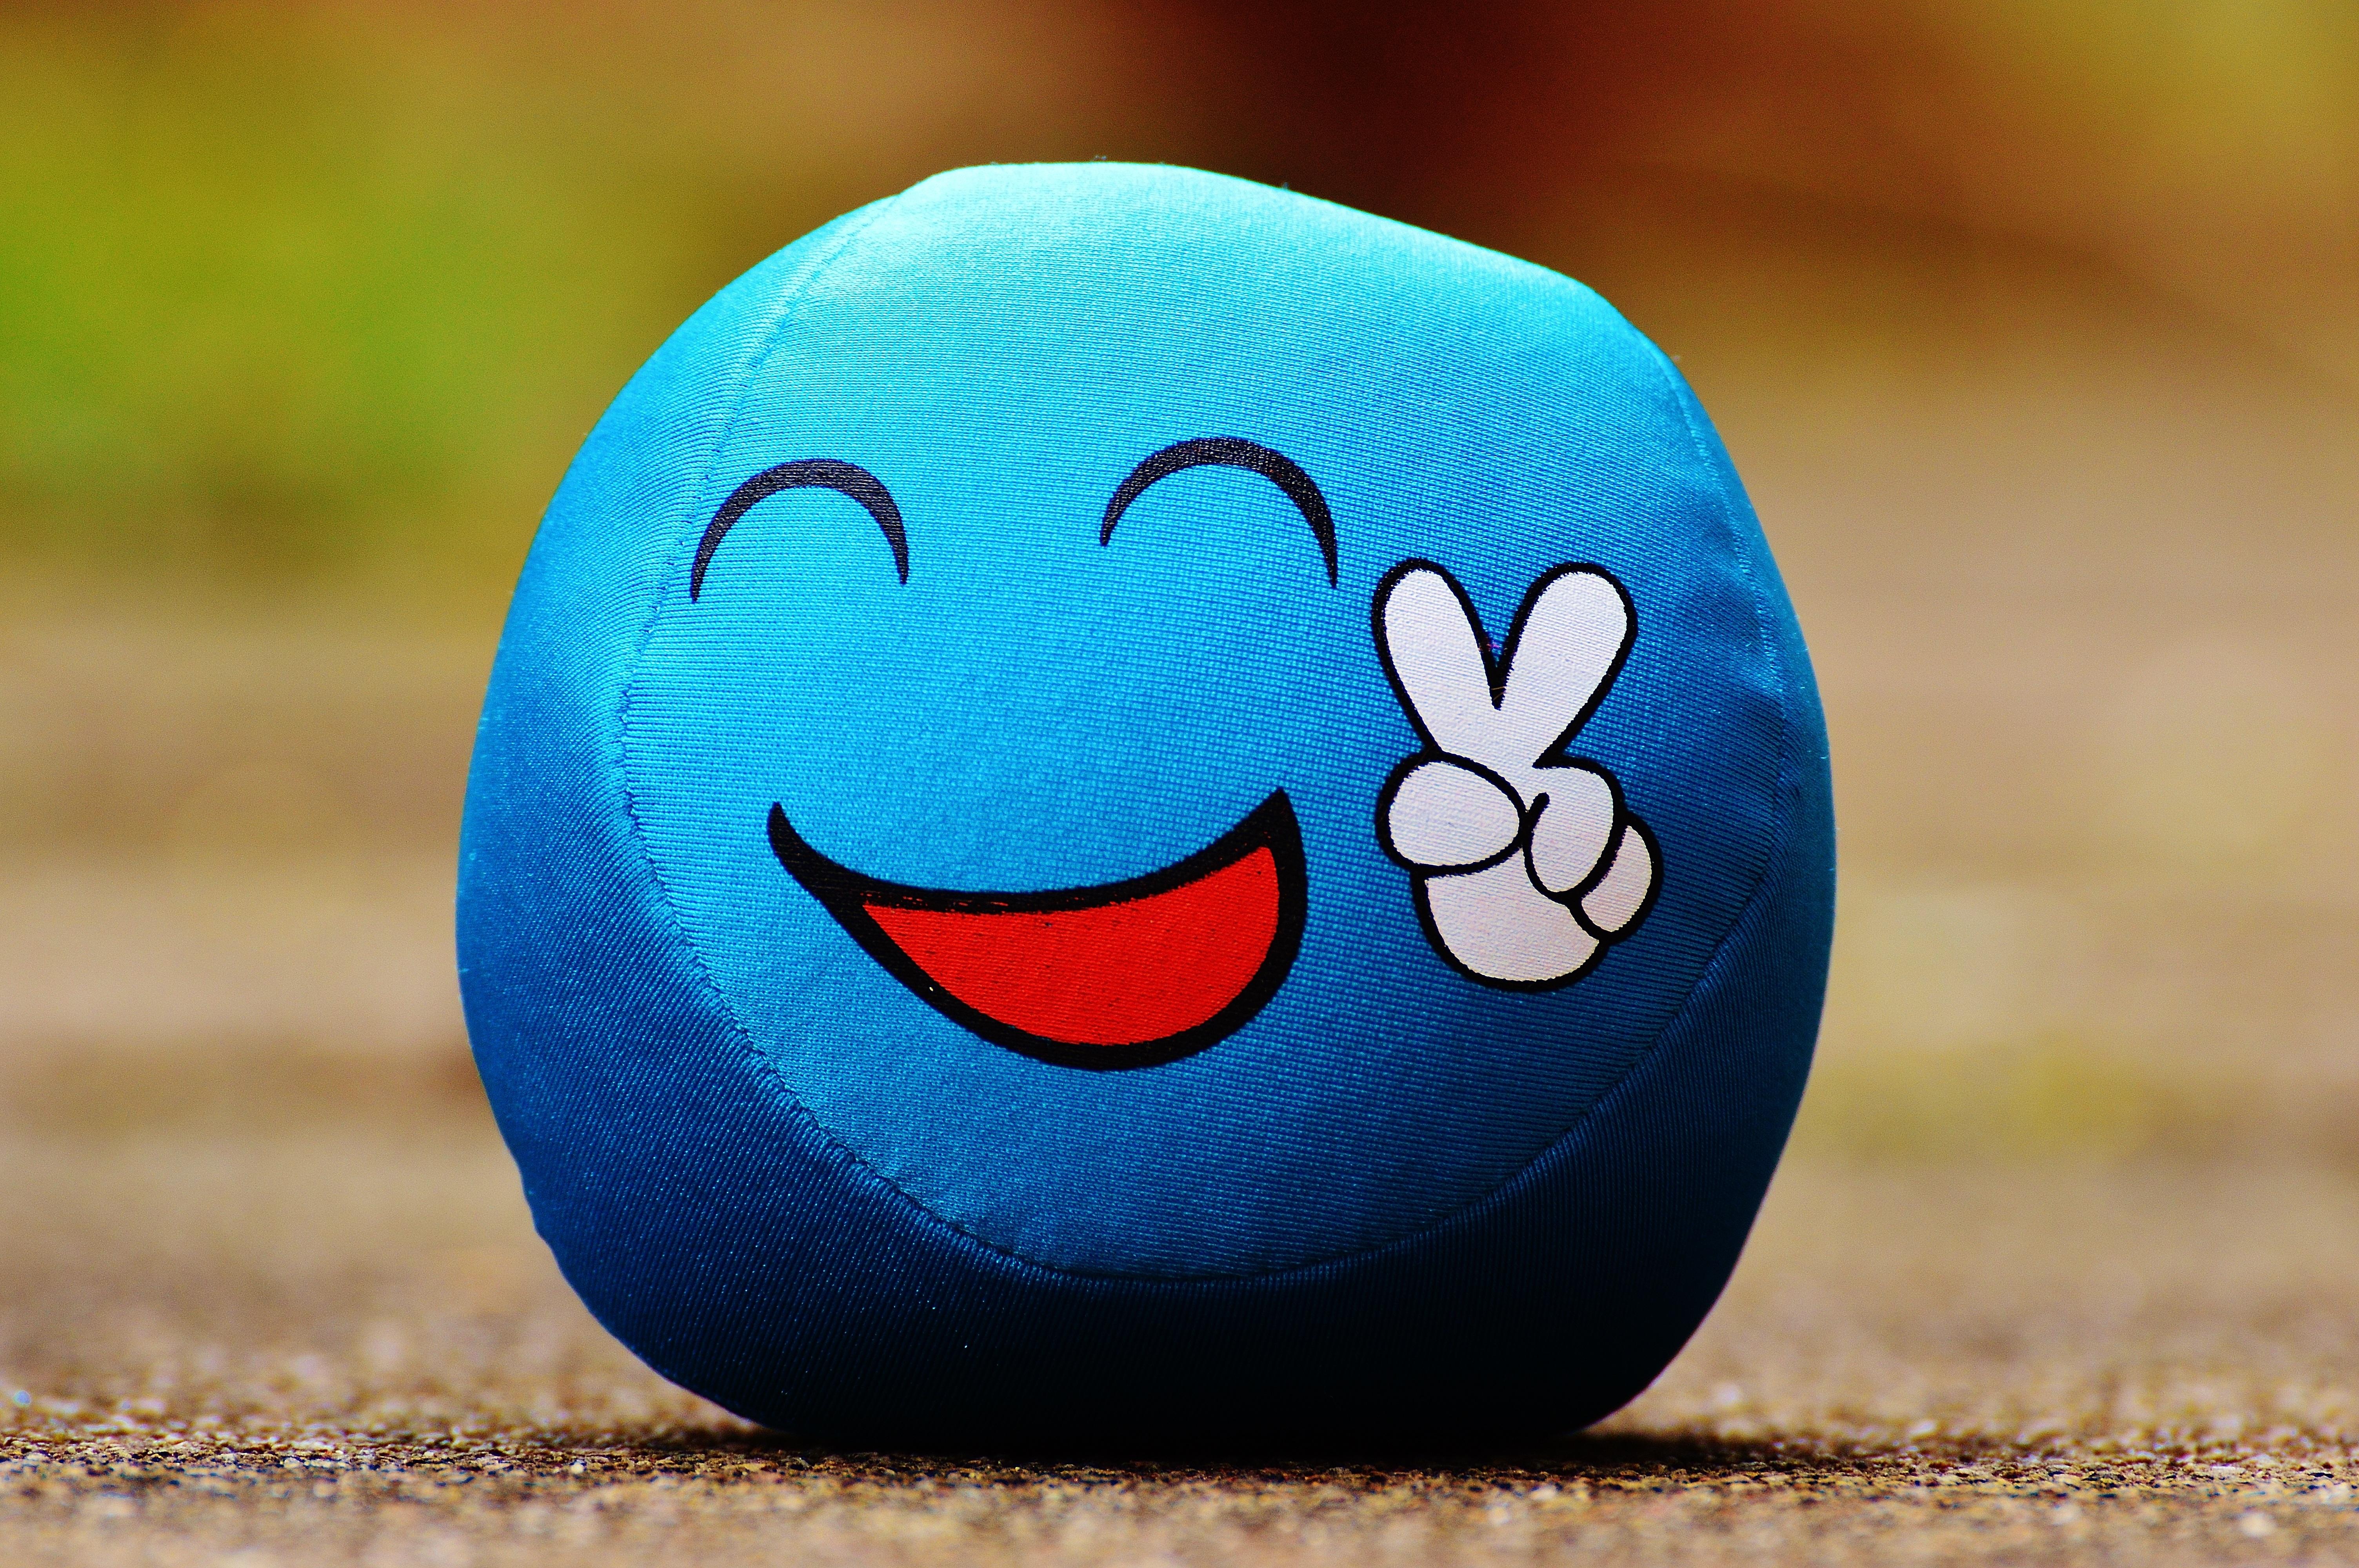 Картинка улыбка прикольная